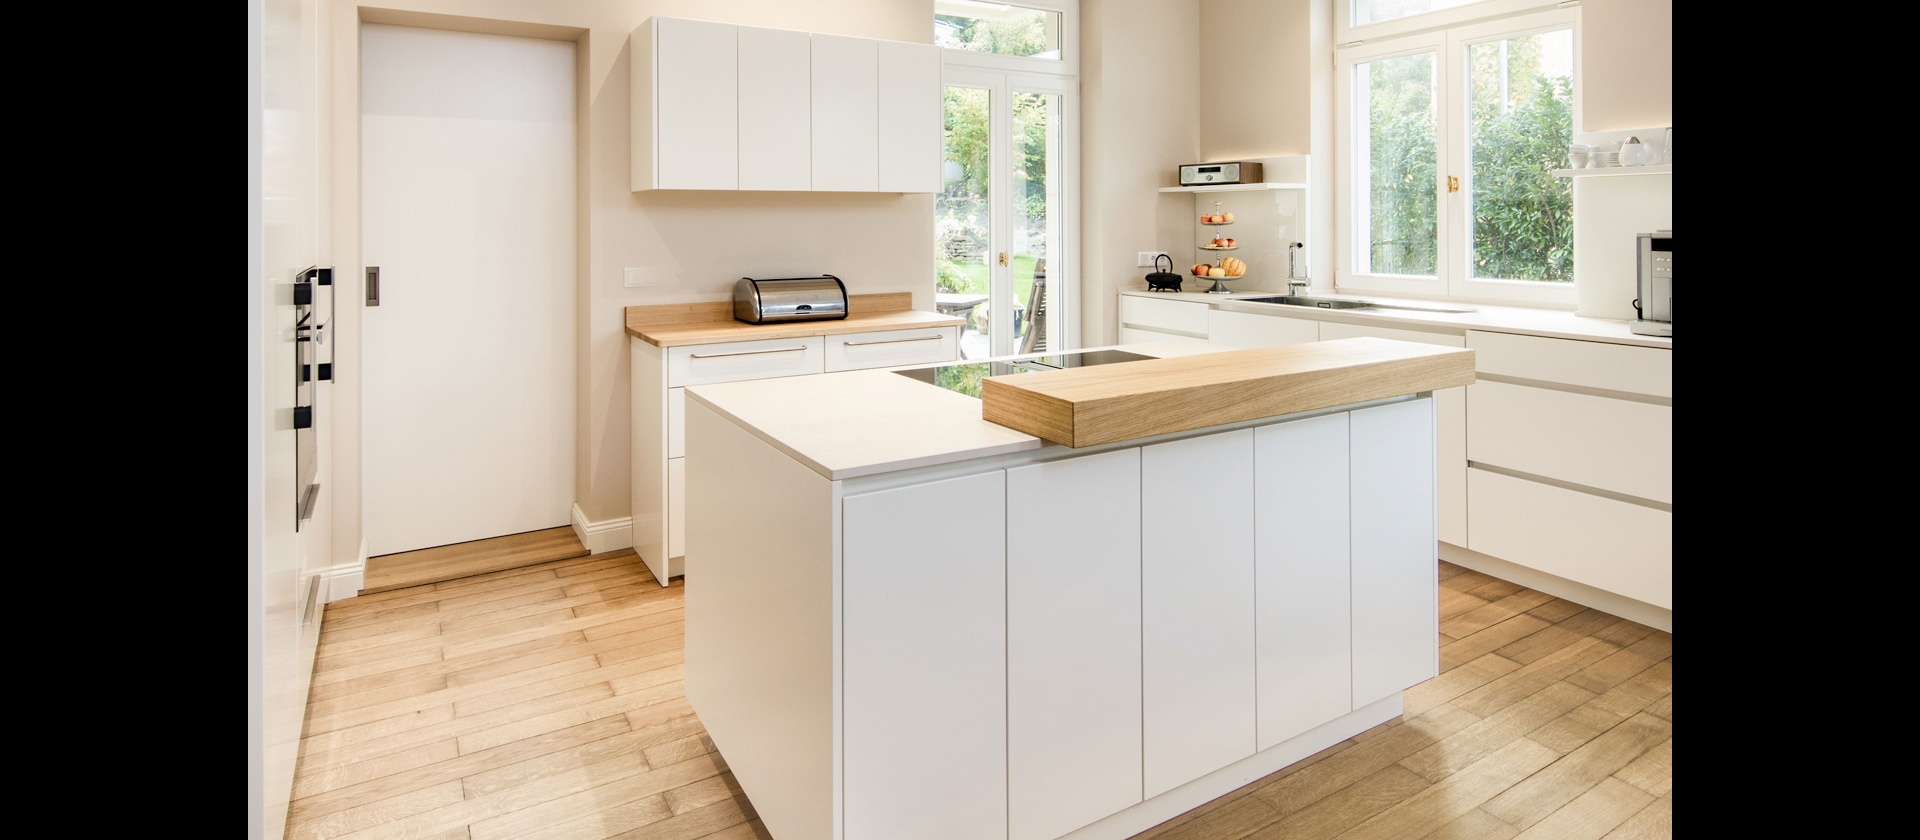 MTB-Küche Mattlack weiss, Arbeitsplatten Decton